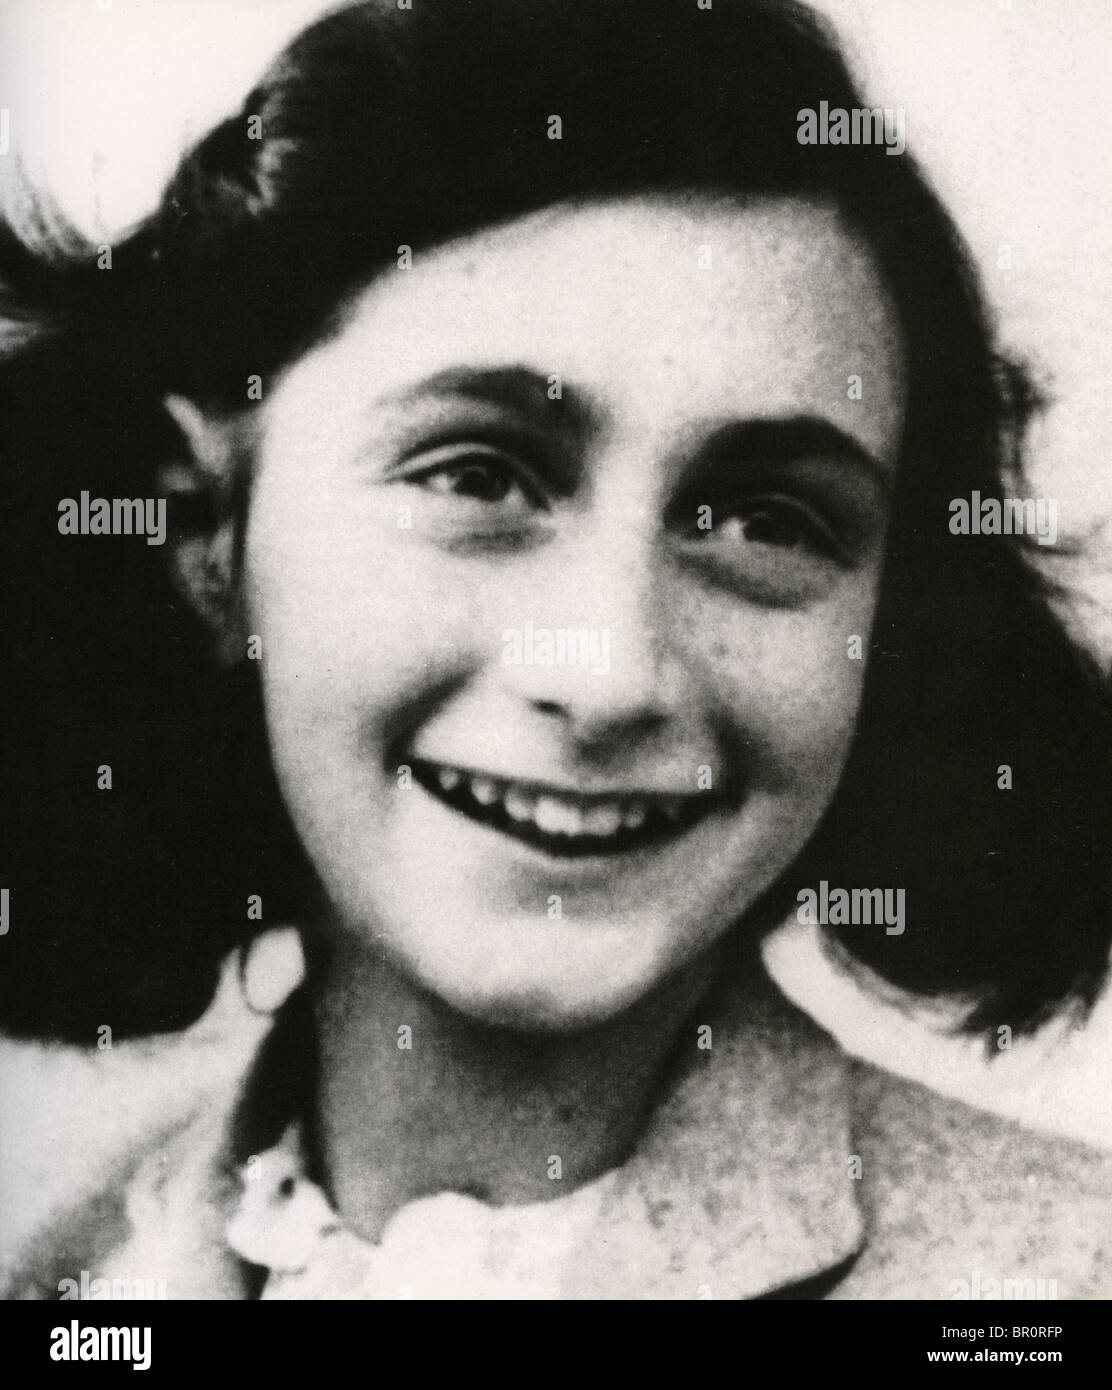 ANNE Frank (1929-1945) Holandés judío víctima del Holocausto Foto de stock